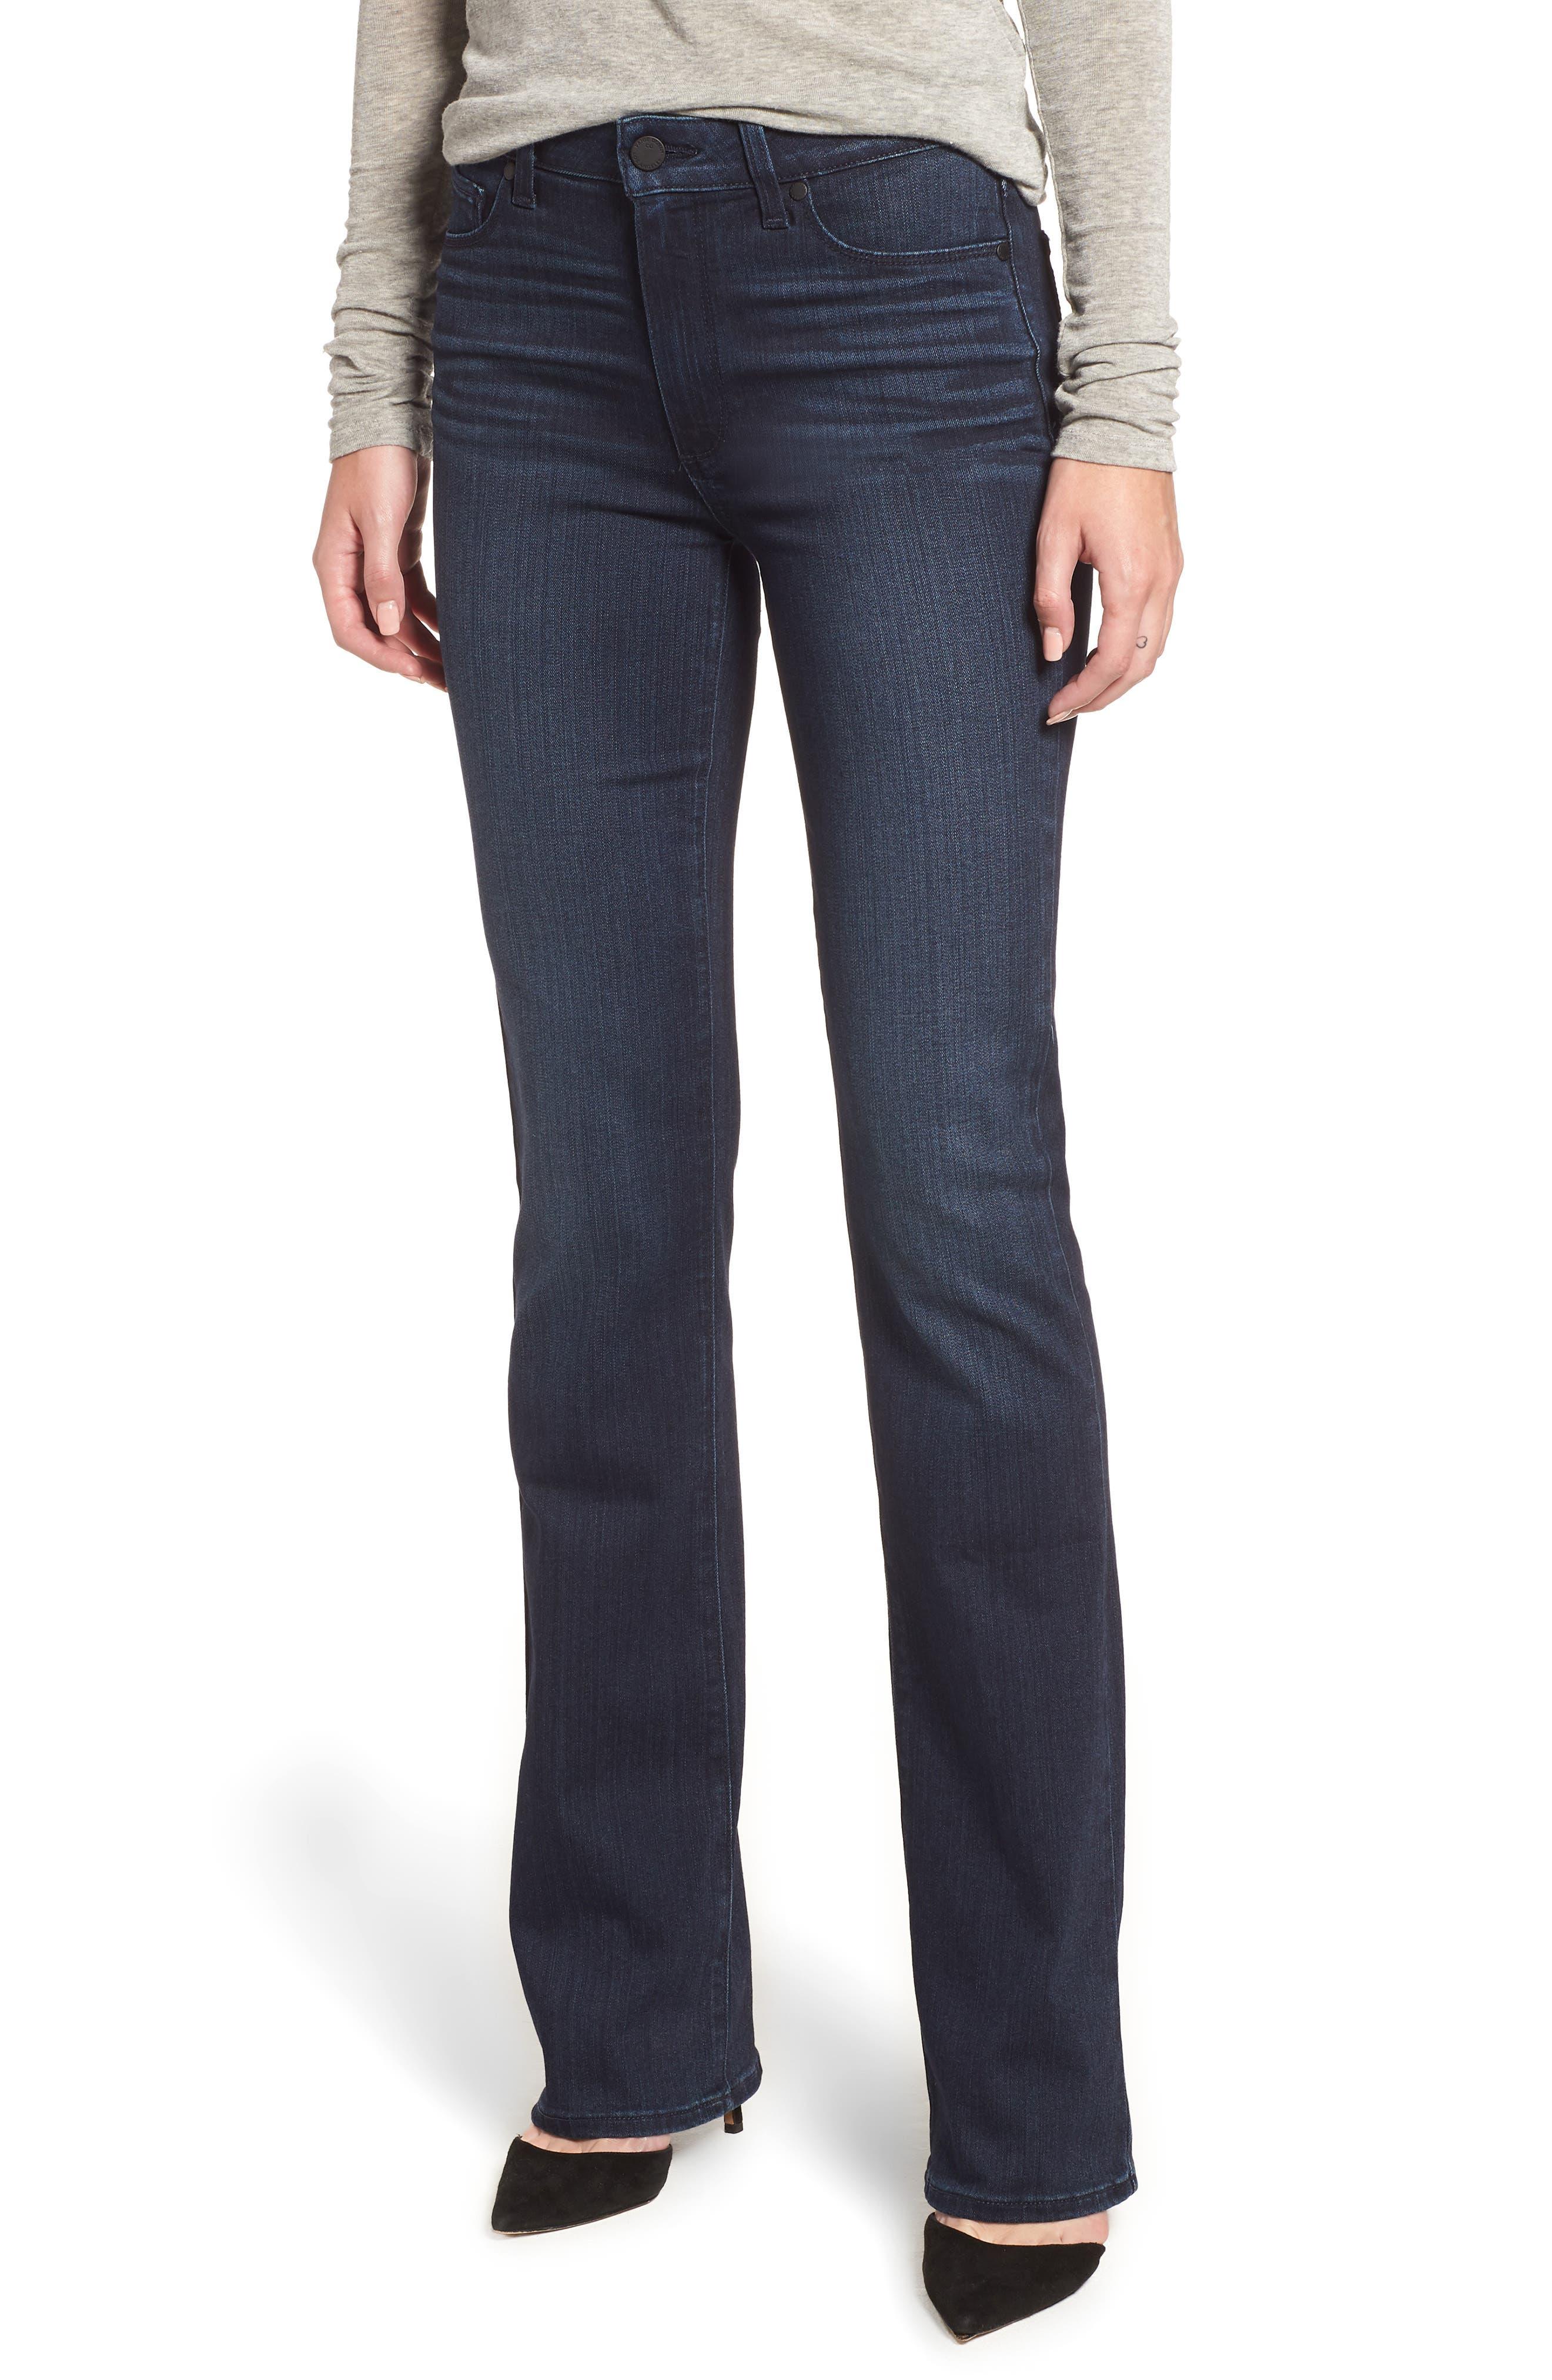 PAIGE Manhattan High Waist Bootcut Jeans, Main, color, ROSEVILLE